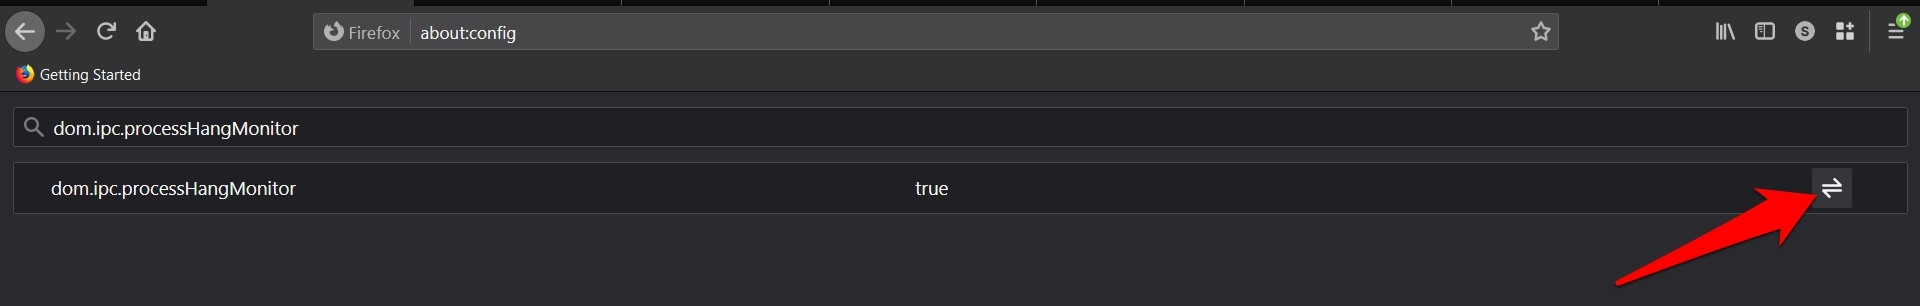 dom.ipc.processHangMonitor Firefox Config